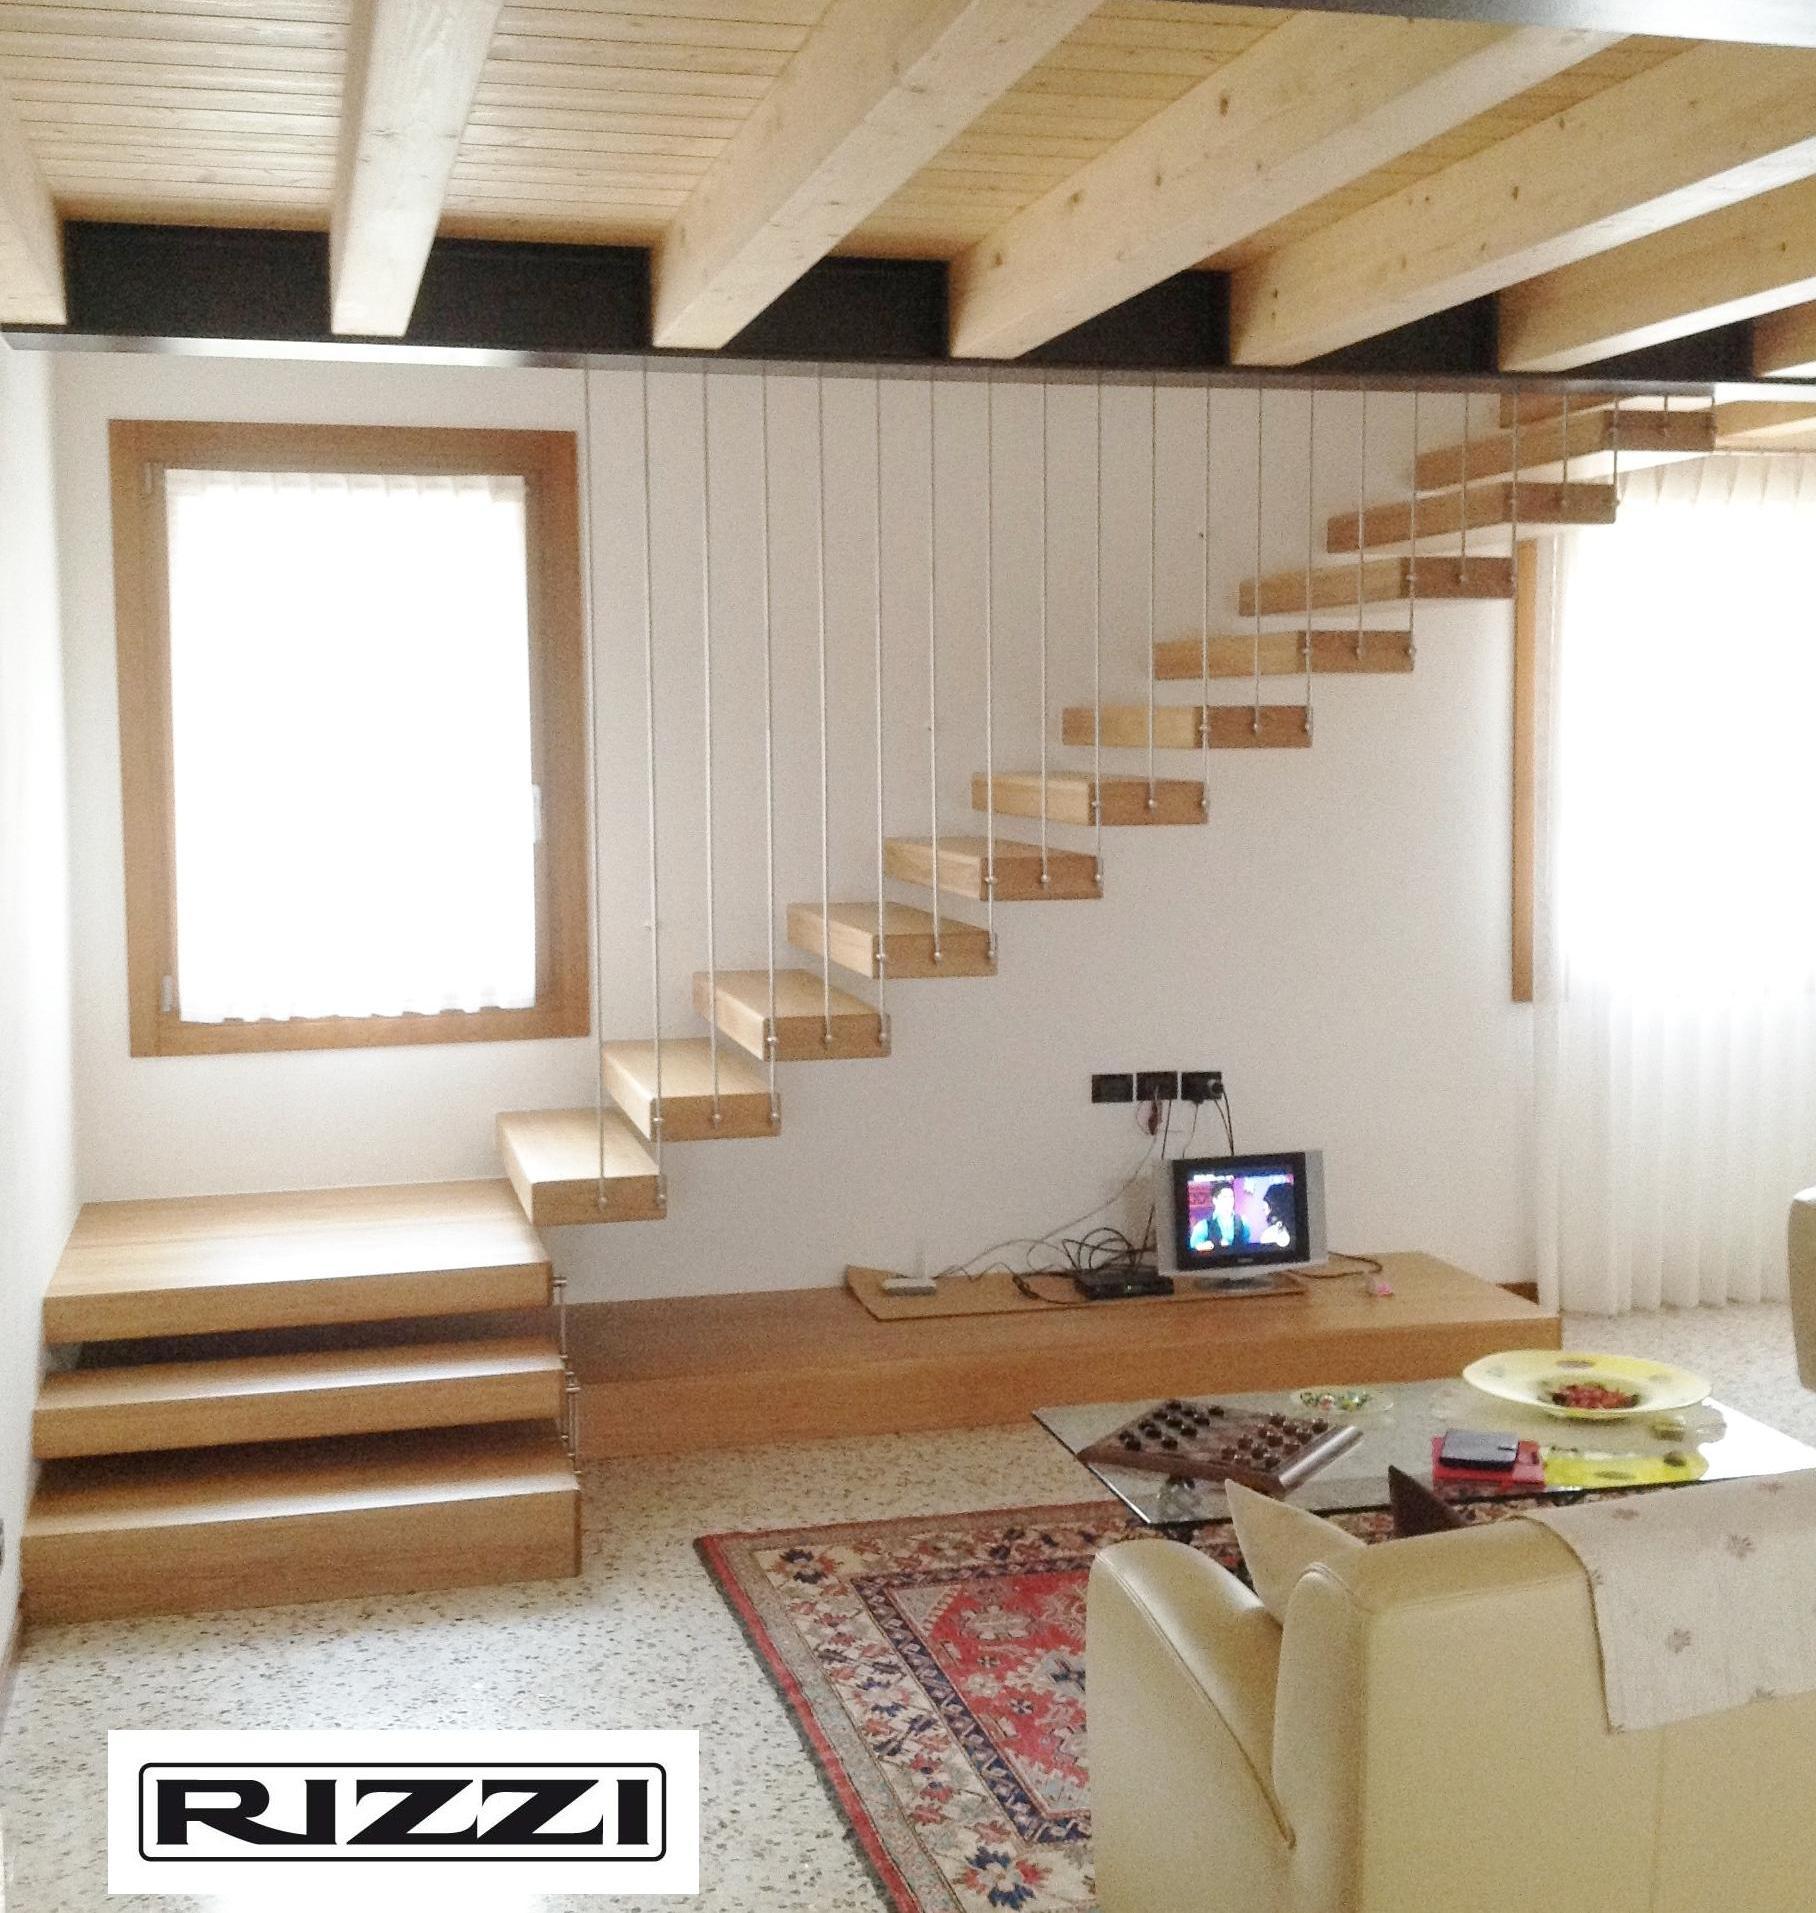 wooden staircase stl 07. Black Bedroom Furniture Sets. Home Design Ideas